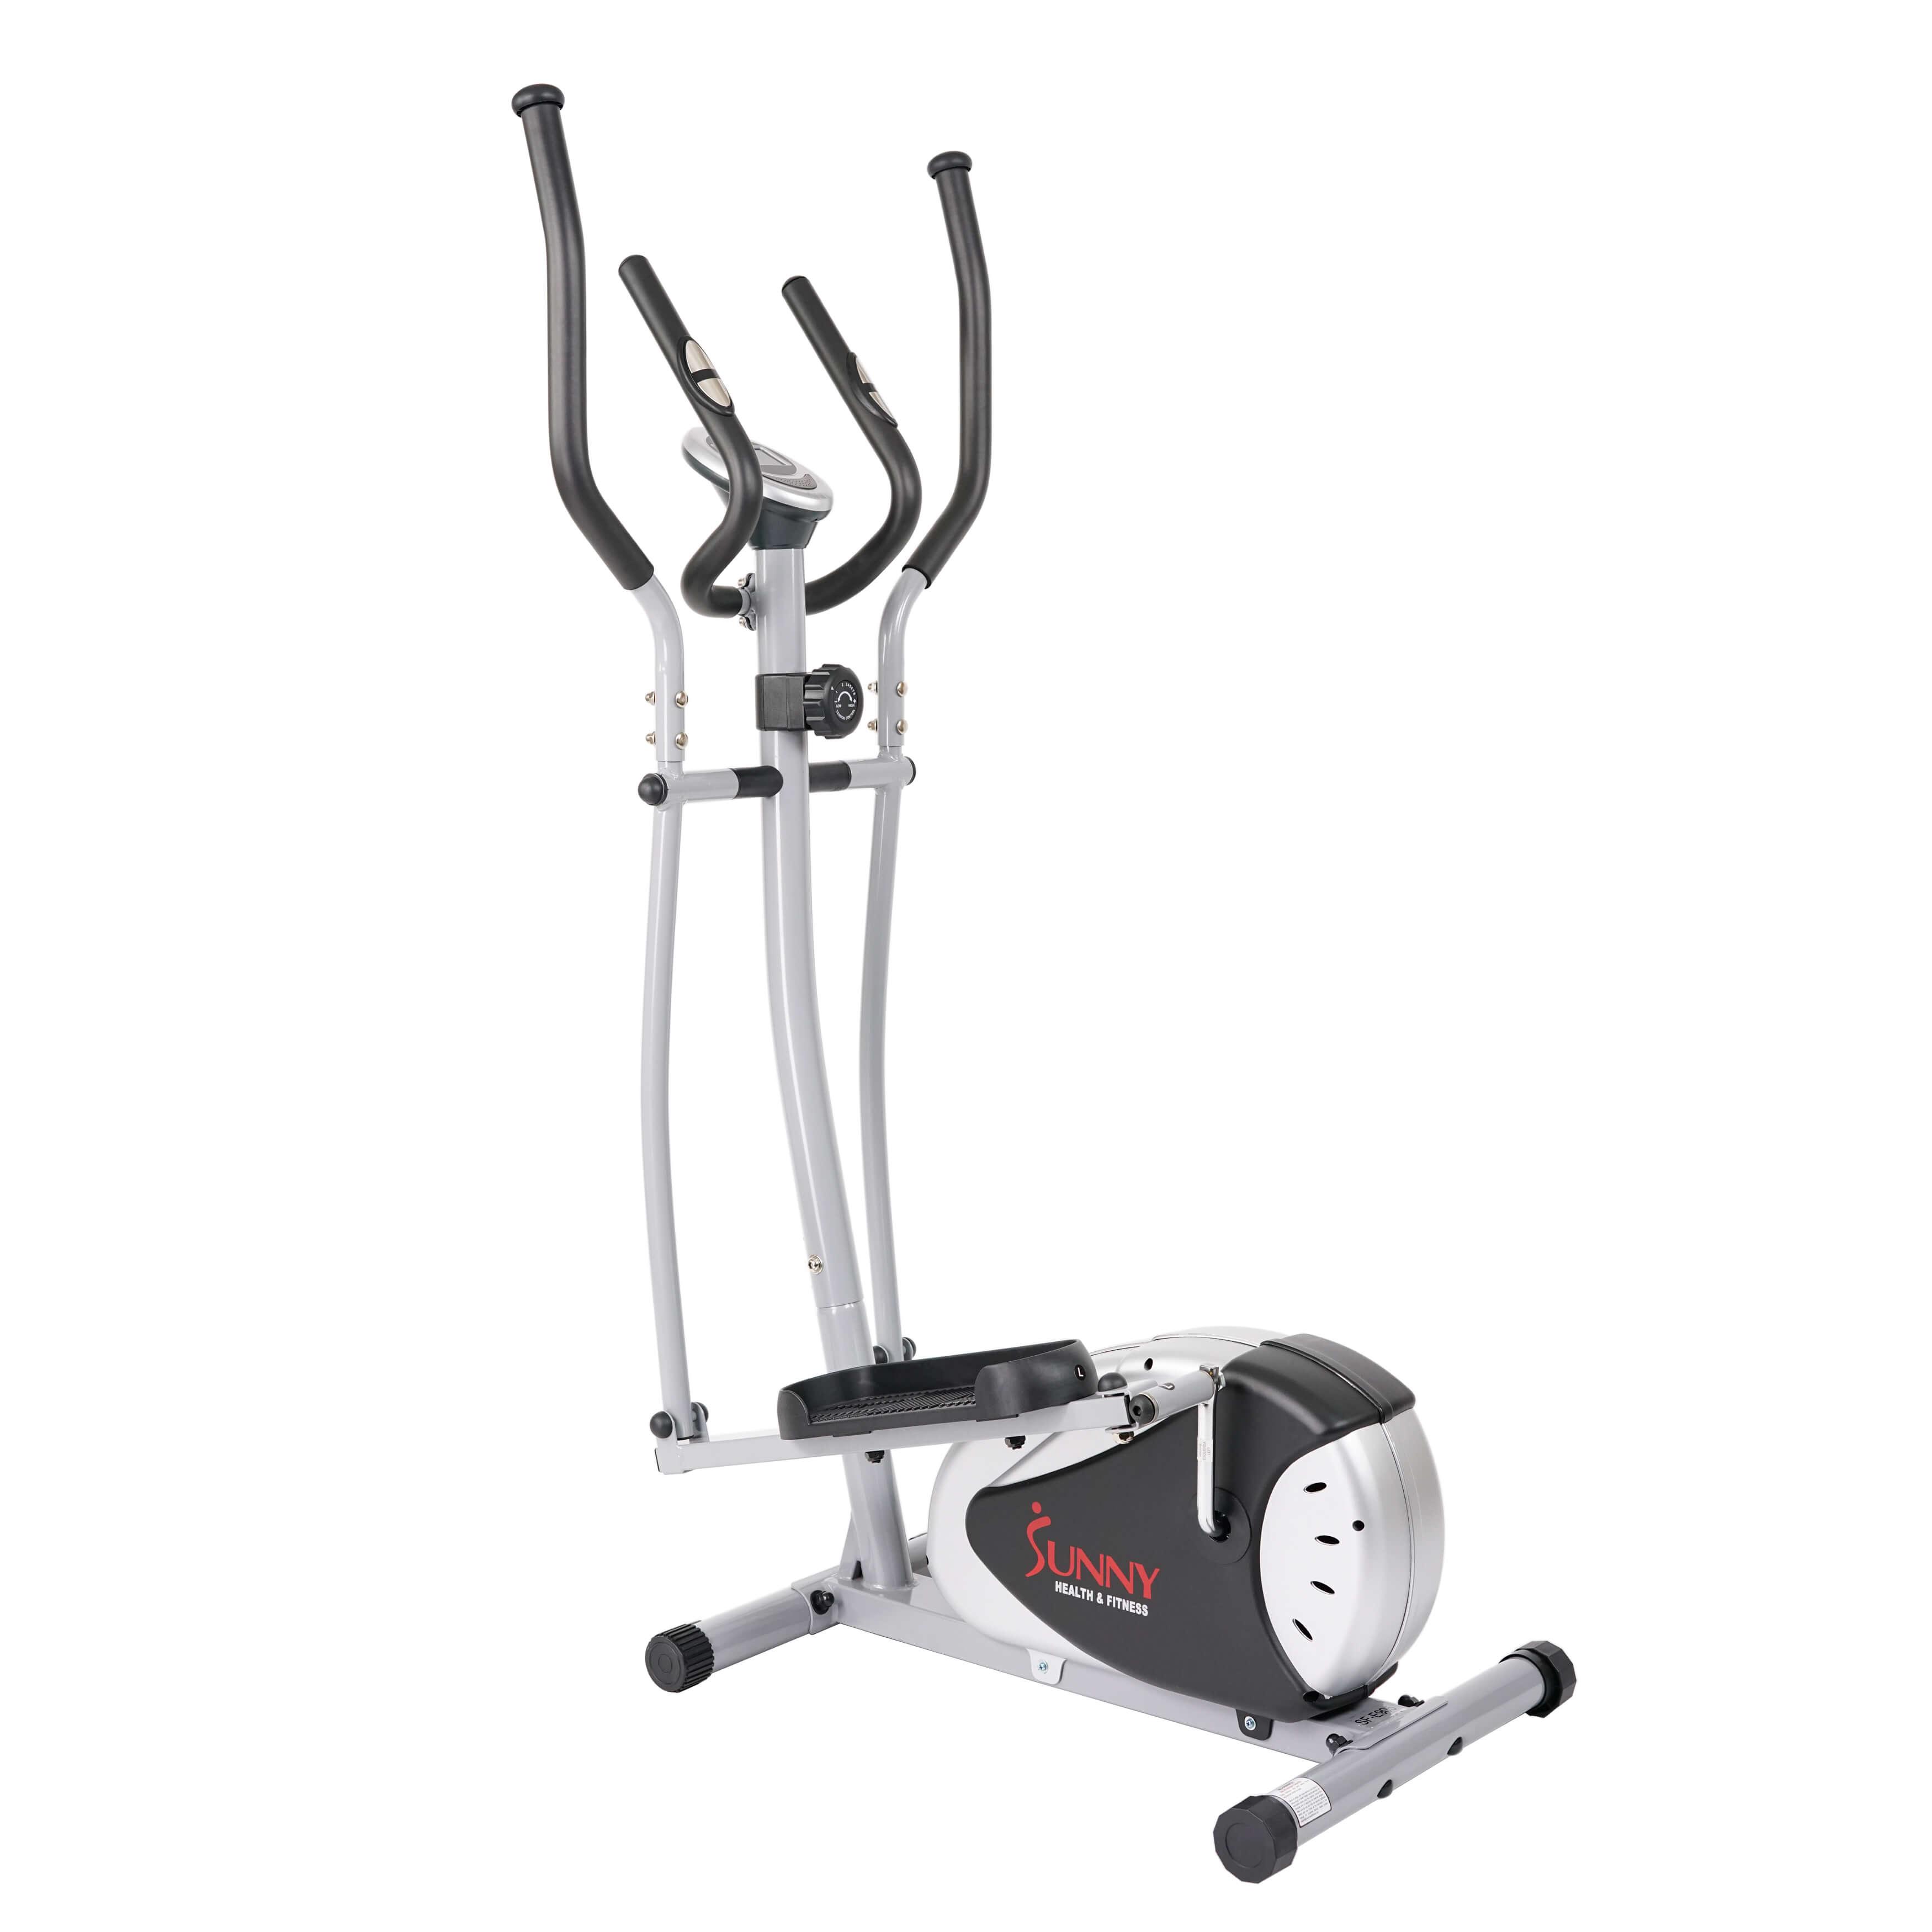 Sunny Health & Fitness SF-E905 Magnetic Elliptical Bike Elliptical Machine w/ LCD Monitor and Heart Rate Monitoring